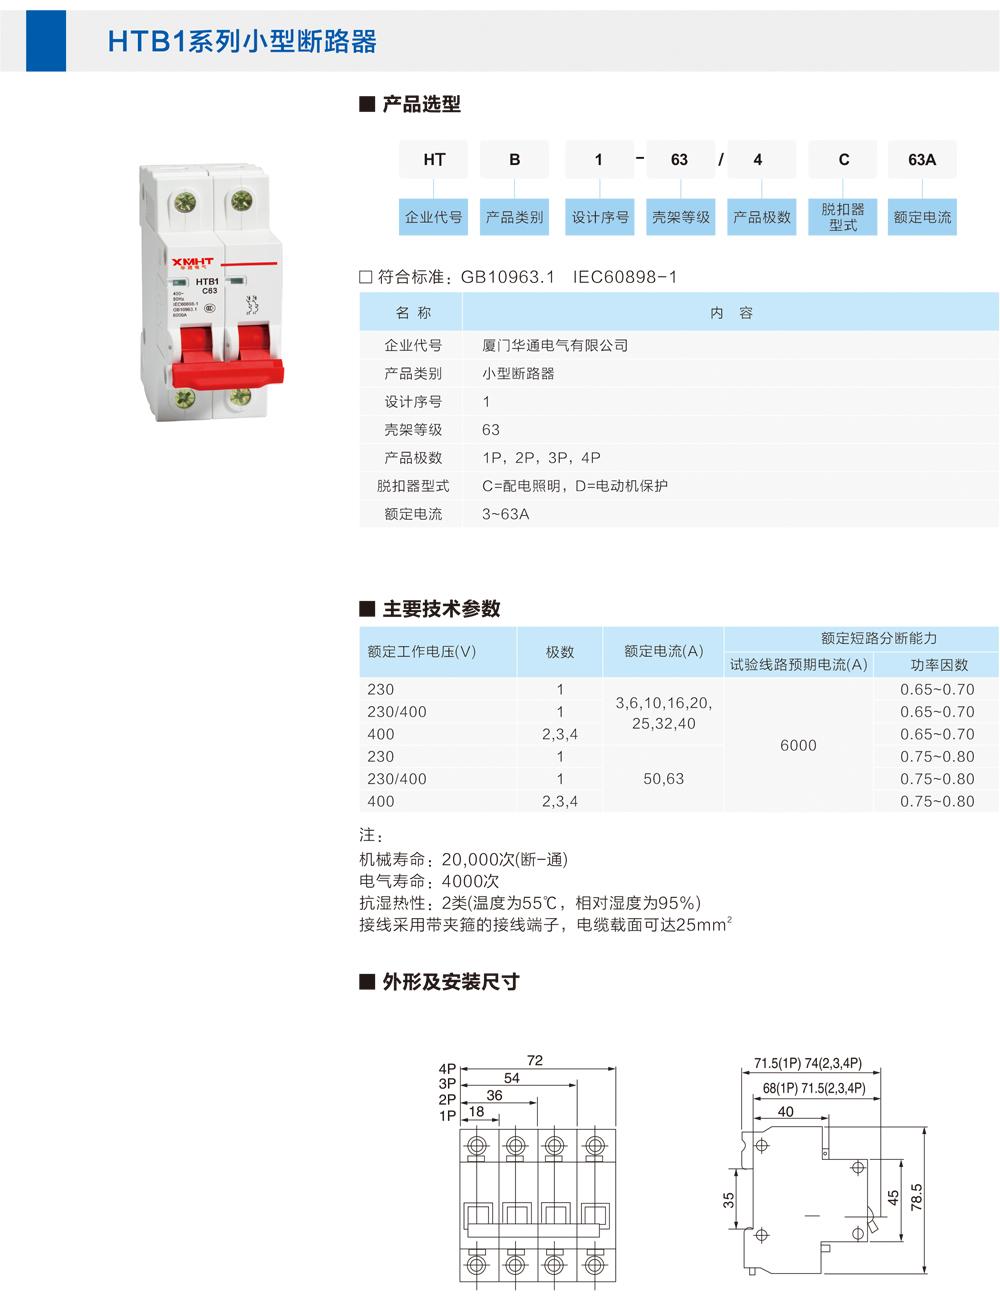 HTB1系列小型断路器详情1.jpg